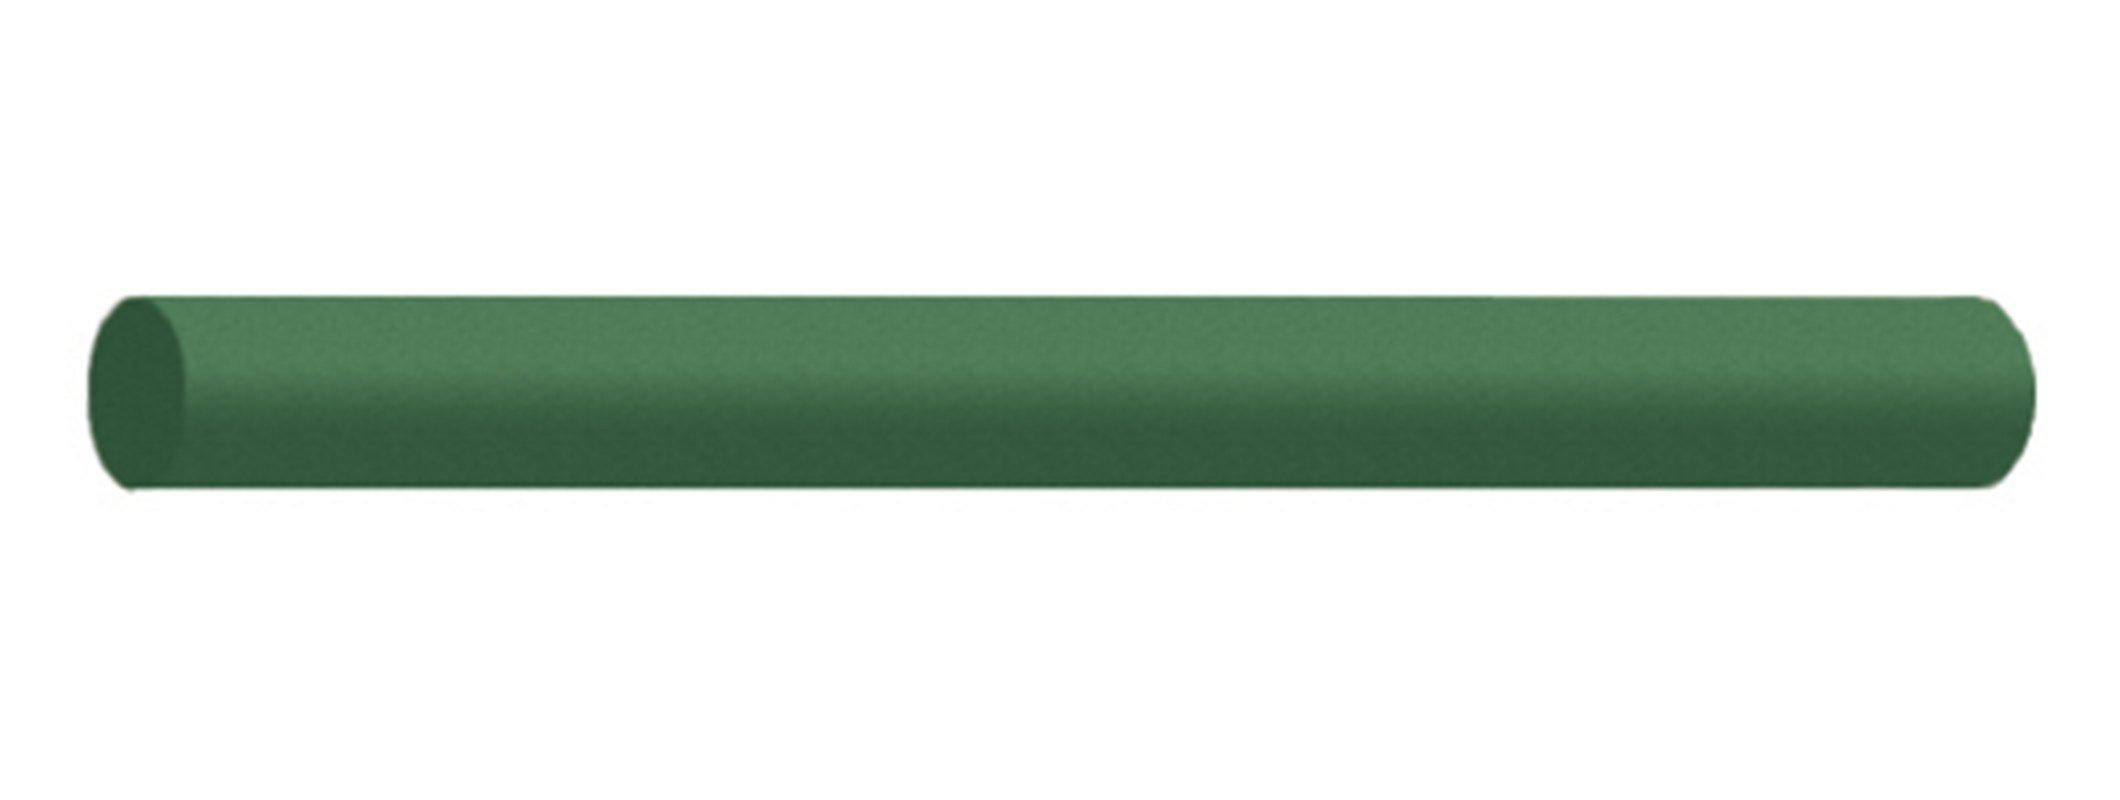 Dedeco 0243 Rubberized Abrasive Block/Stick, Round, Silicon Carbide, Medium, 6'' x 1/2'', Green by Dedeco